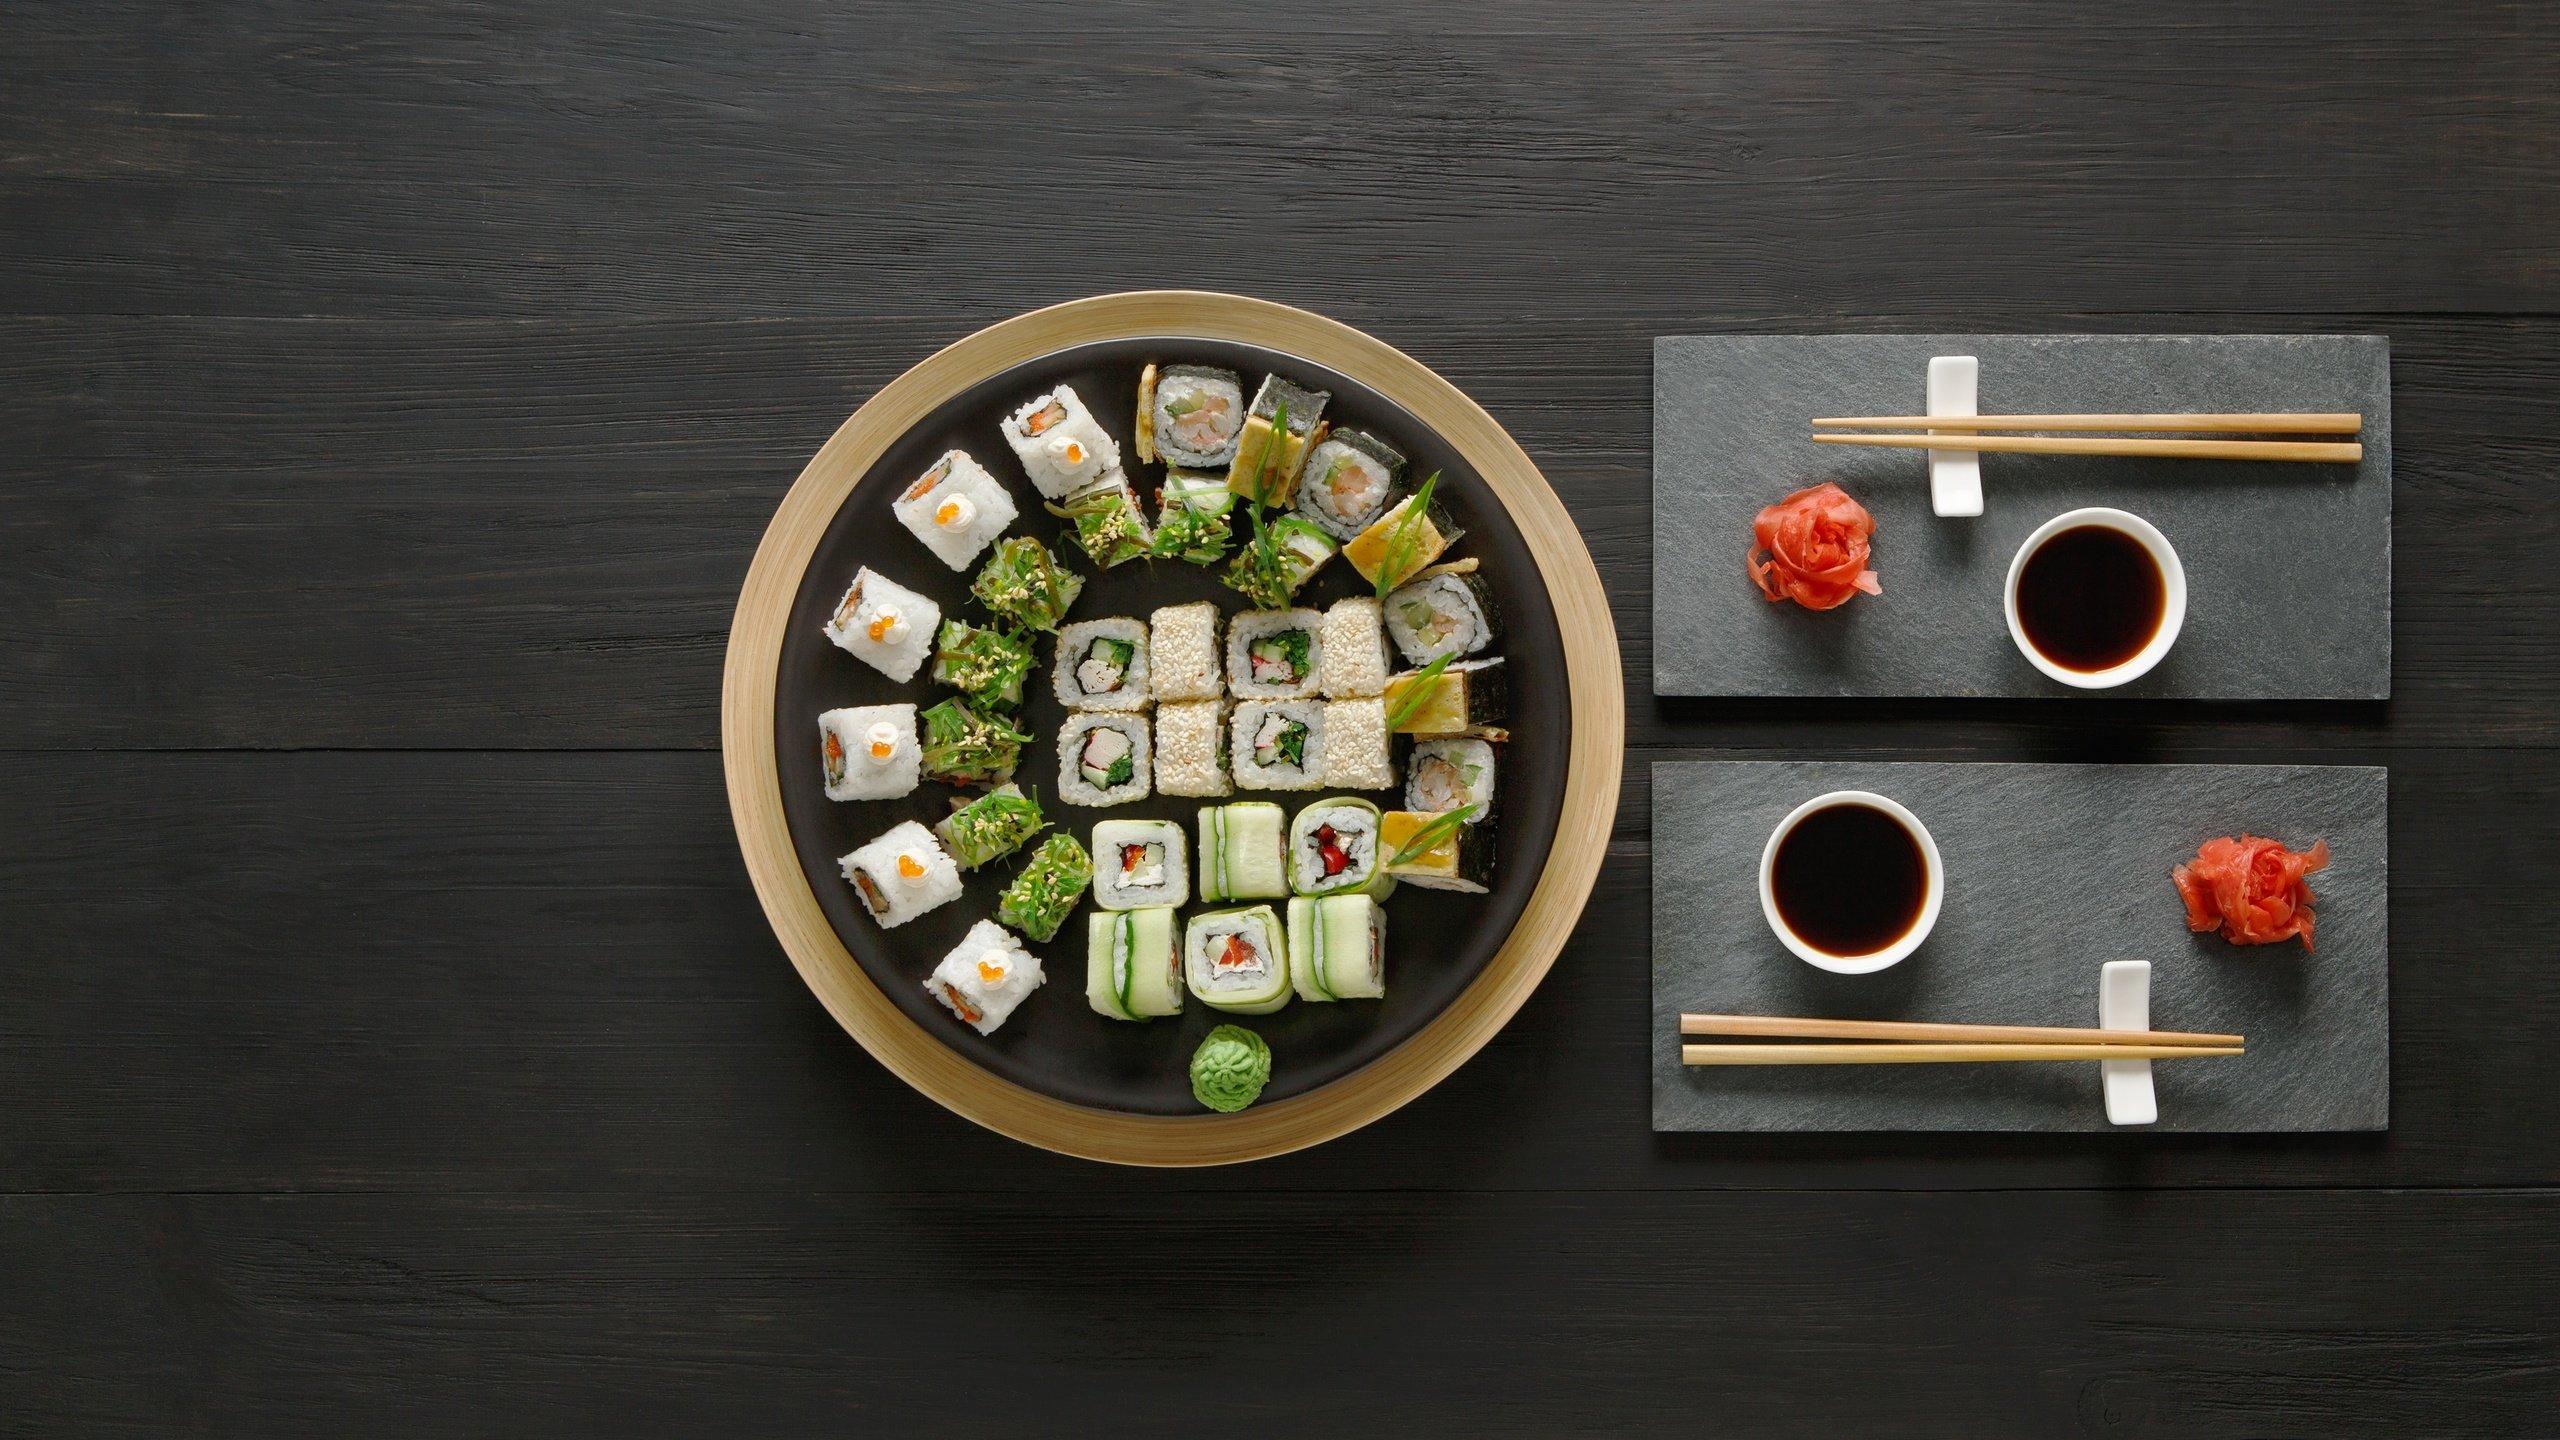 еда роллы васаби имбирь food rolls wasabi ginger загрузить